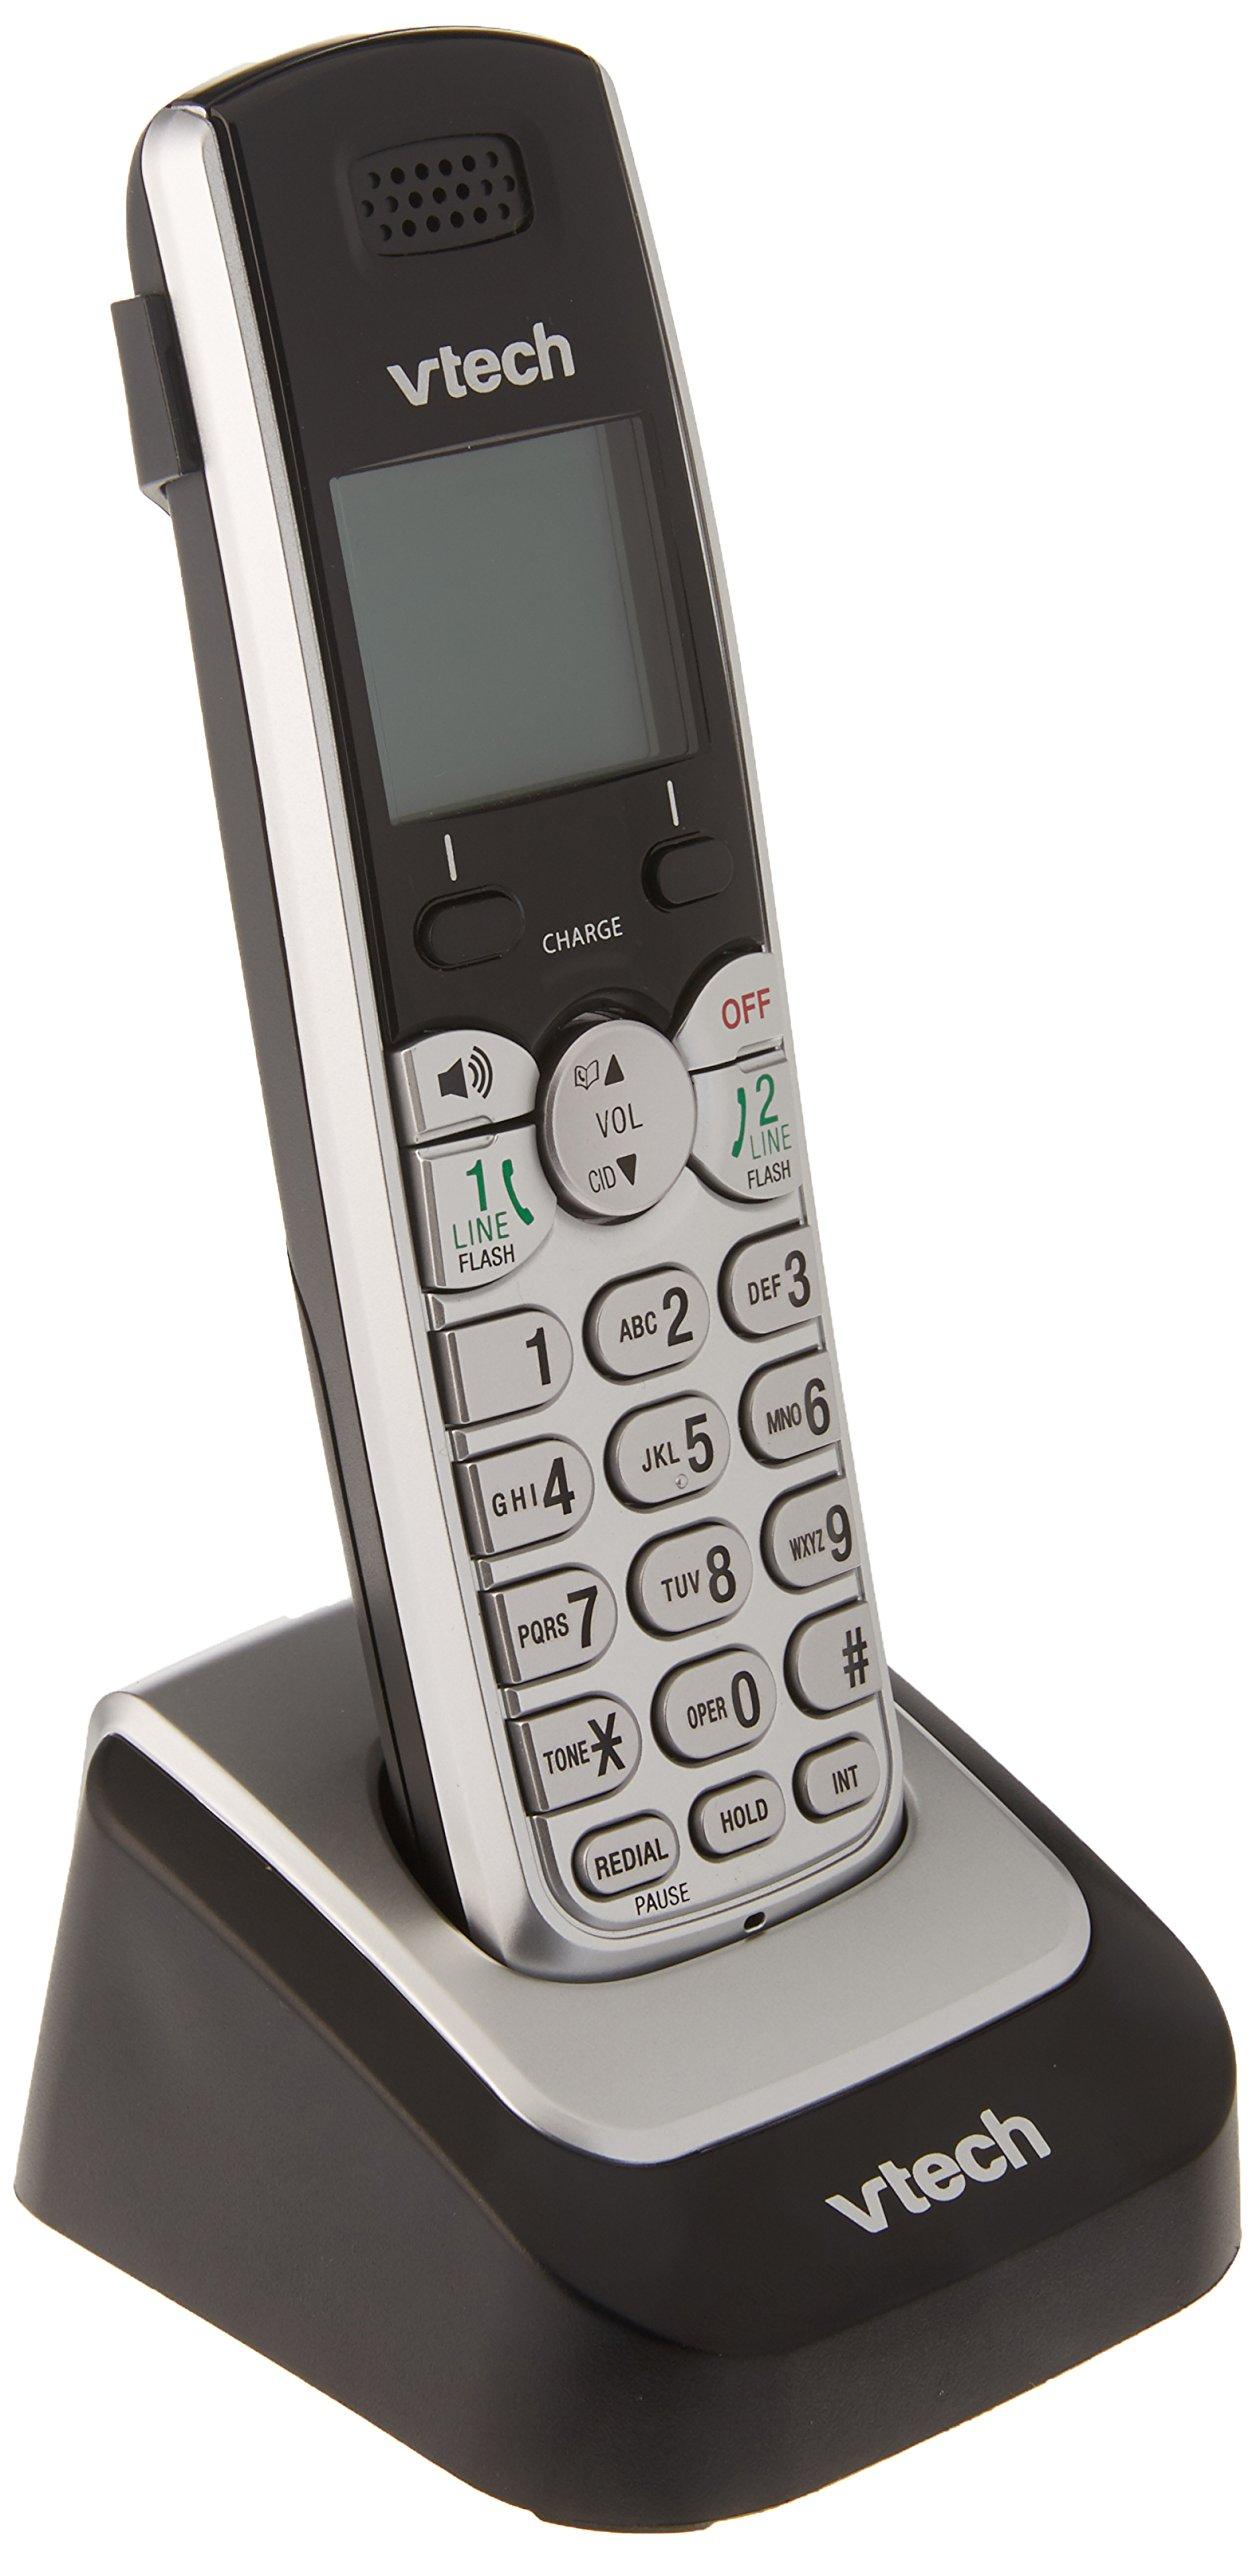 Vtech 2-line Accessory Handset for DS6151 (Cordless Telephones / DECT 6.0 Cordless Phones)